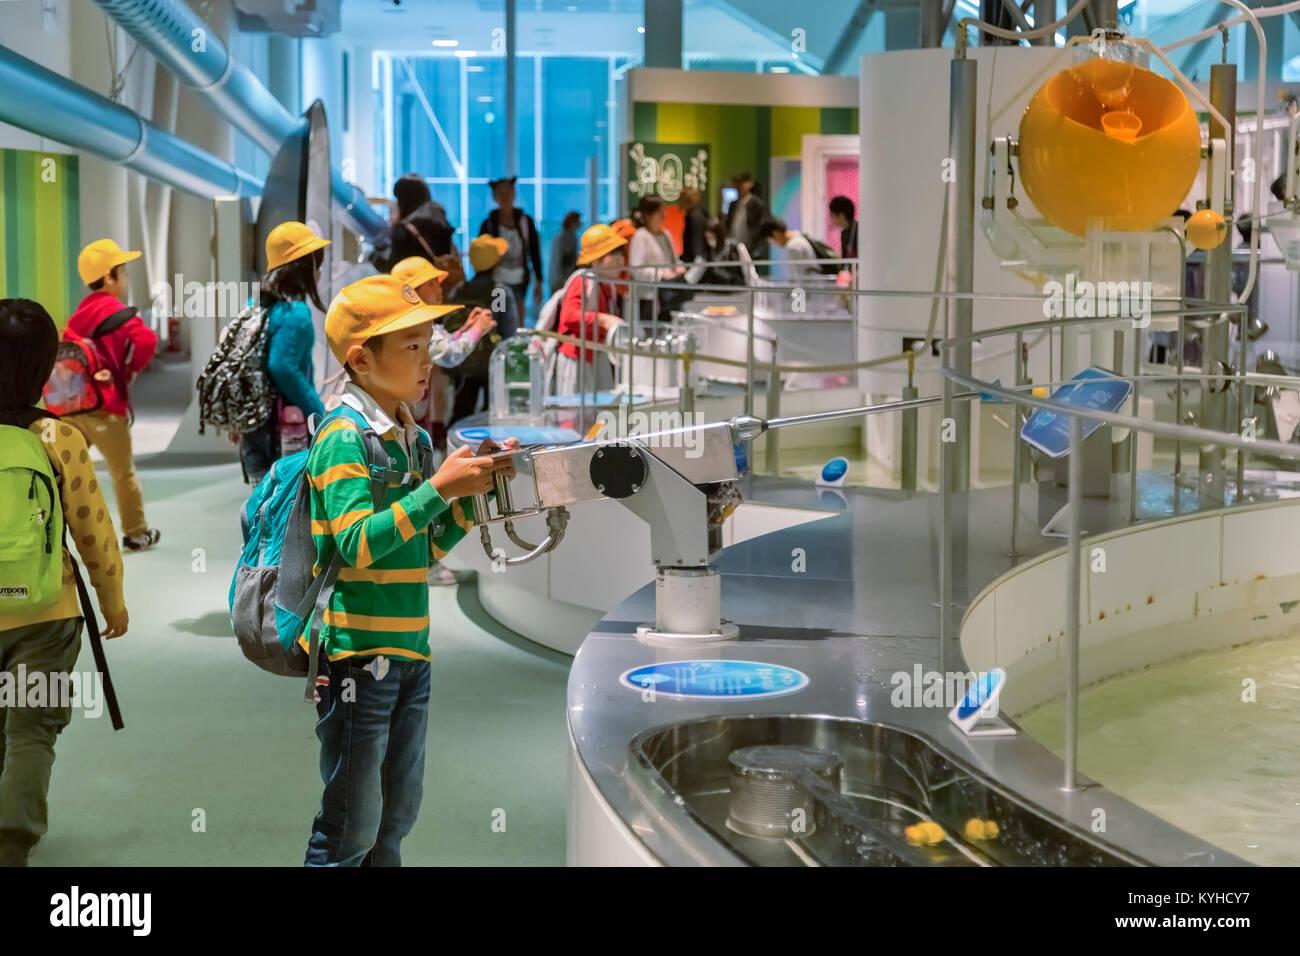 NAGOYA, JAPAN - NOVEMBER 18, 2015: Nagoya City Science Museum houses the largest planetarium in the world, it portrays Stock Photo